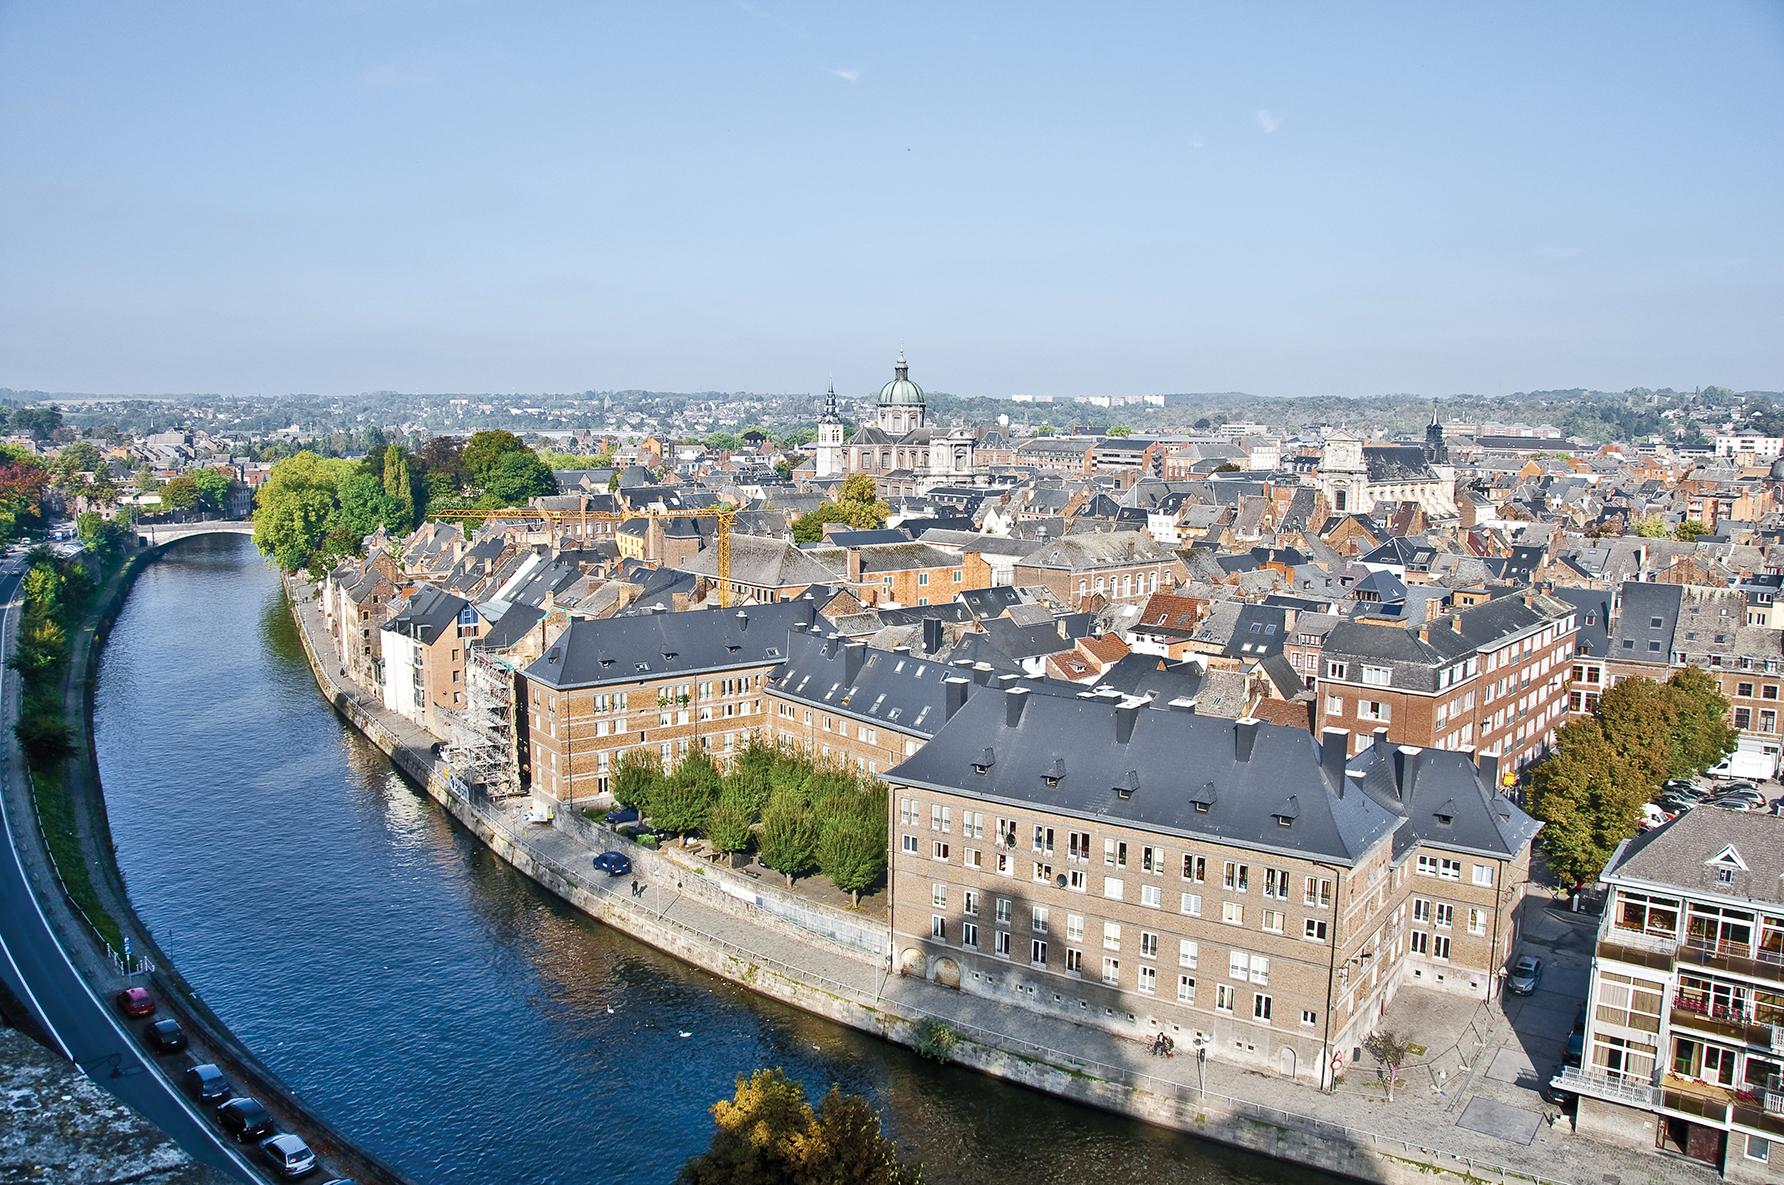 Visites guid es de juillet et ao t visit namur office - Office tourisme strasbourg visites guidees ...